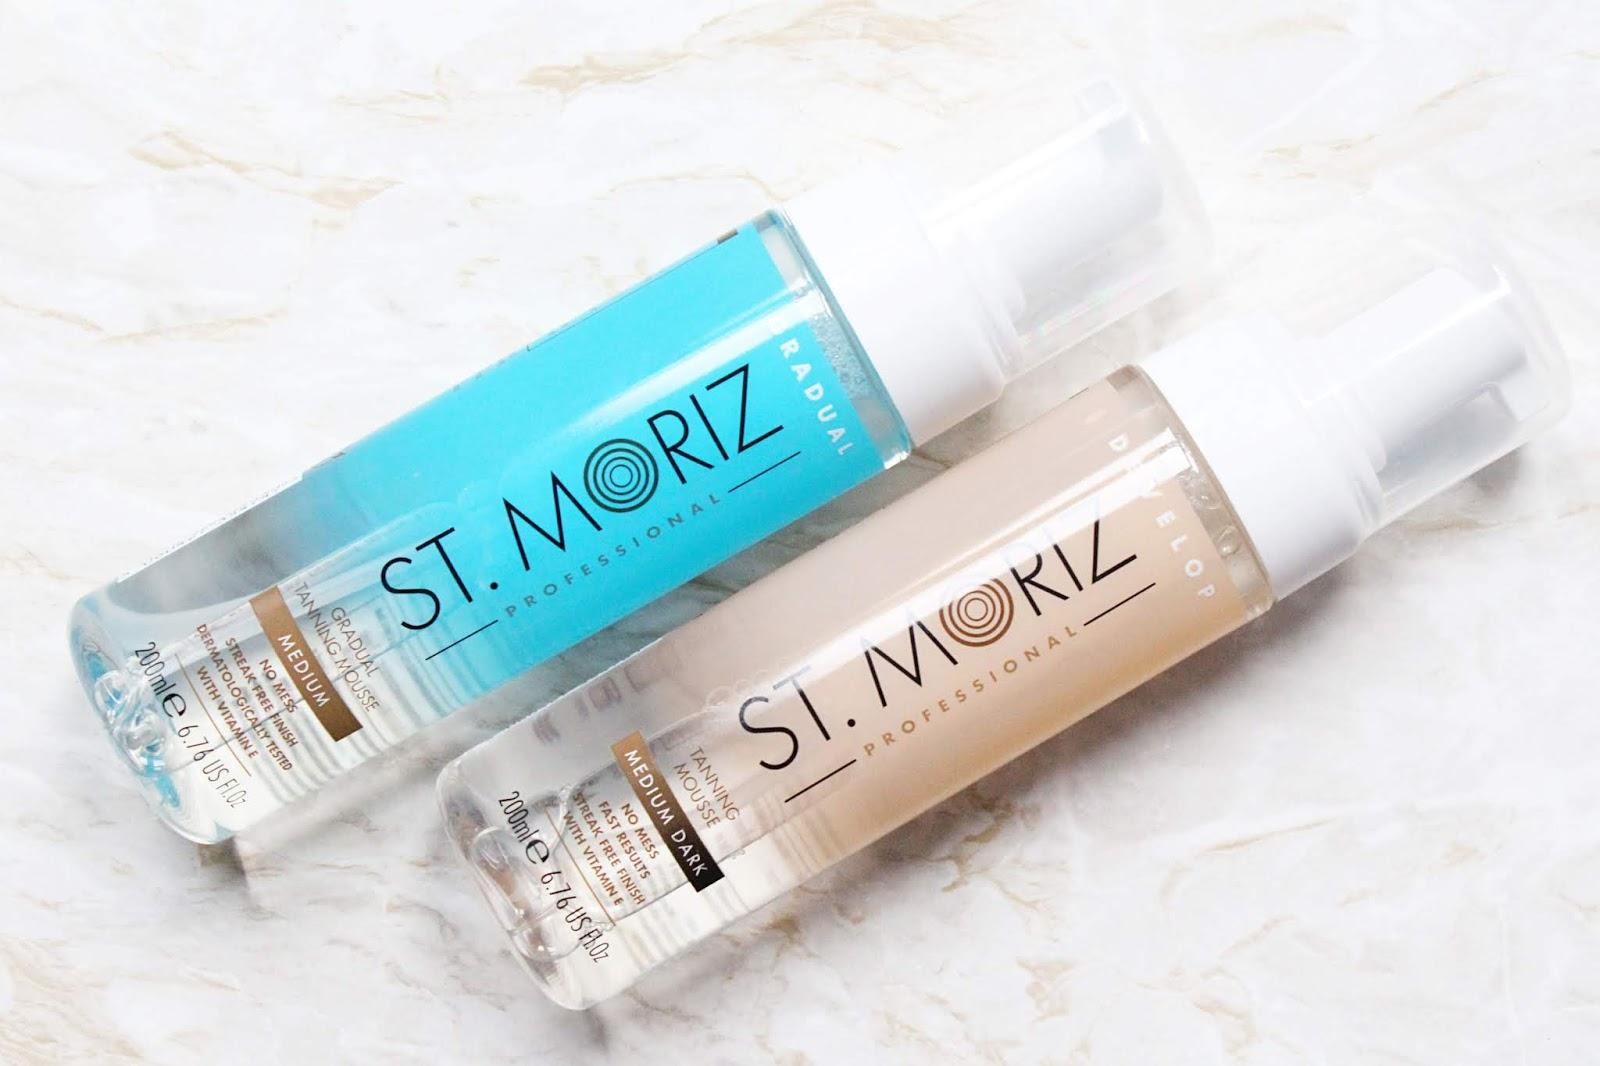 St Moriz Tanning Favourites